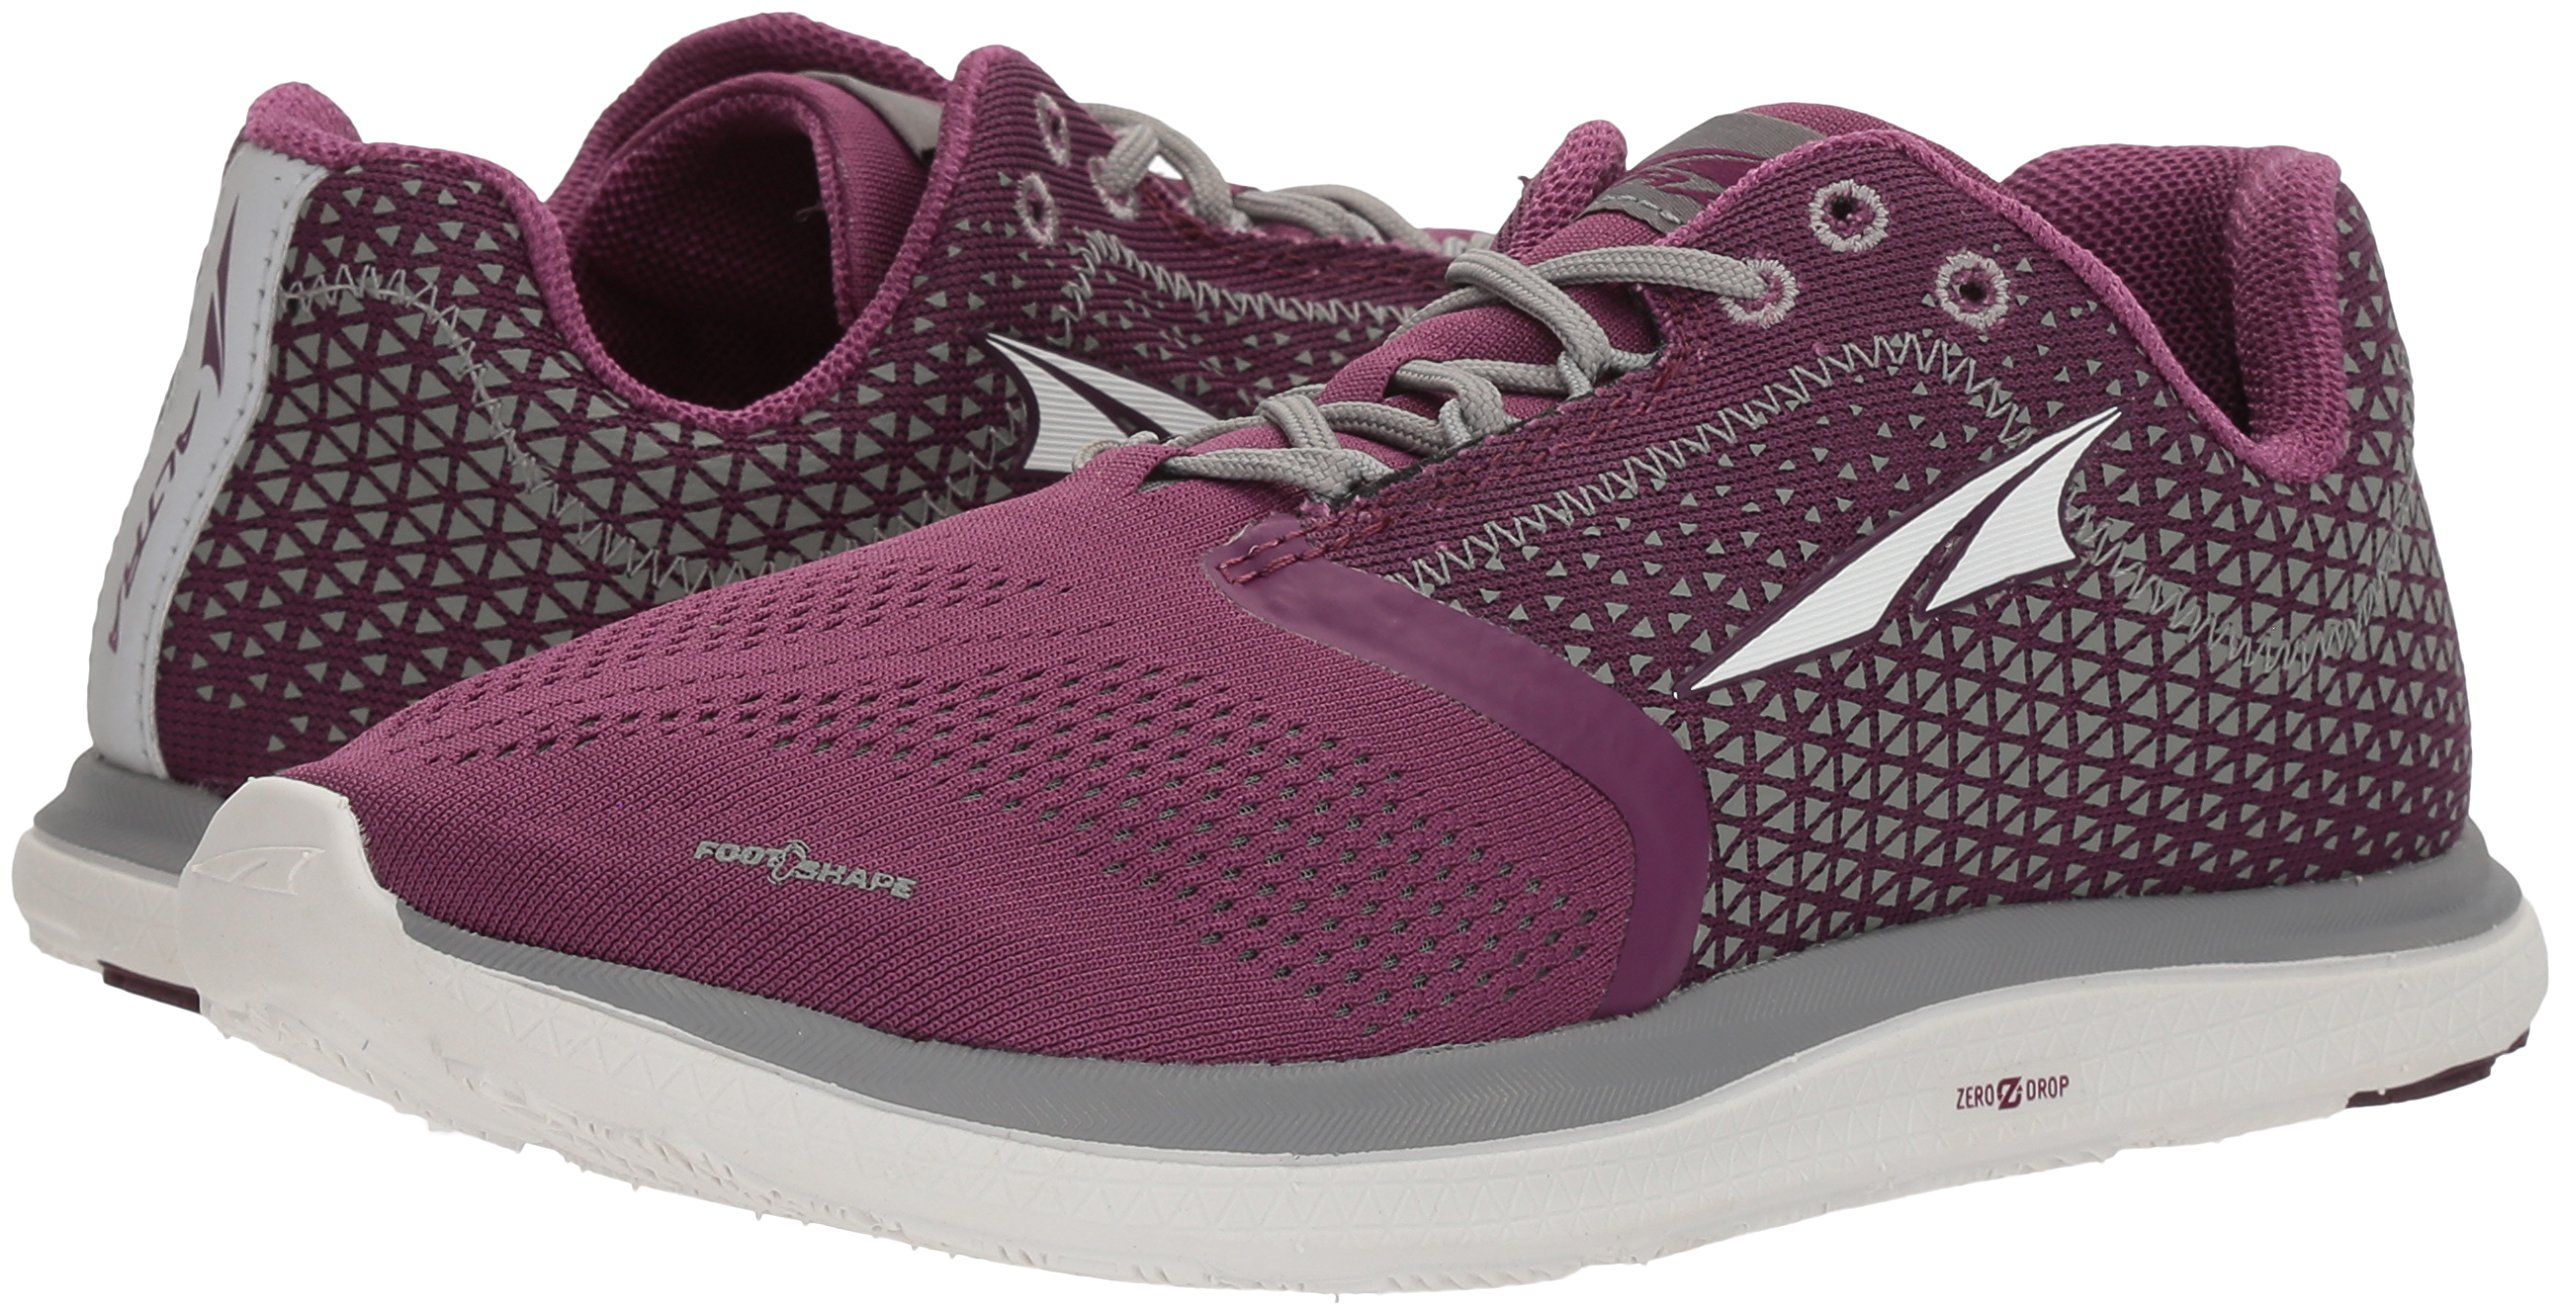 Altra Women's Solstice Sneaker, Purple, 5.5 Regular US by Altra (Image #5)